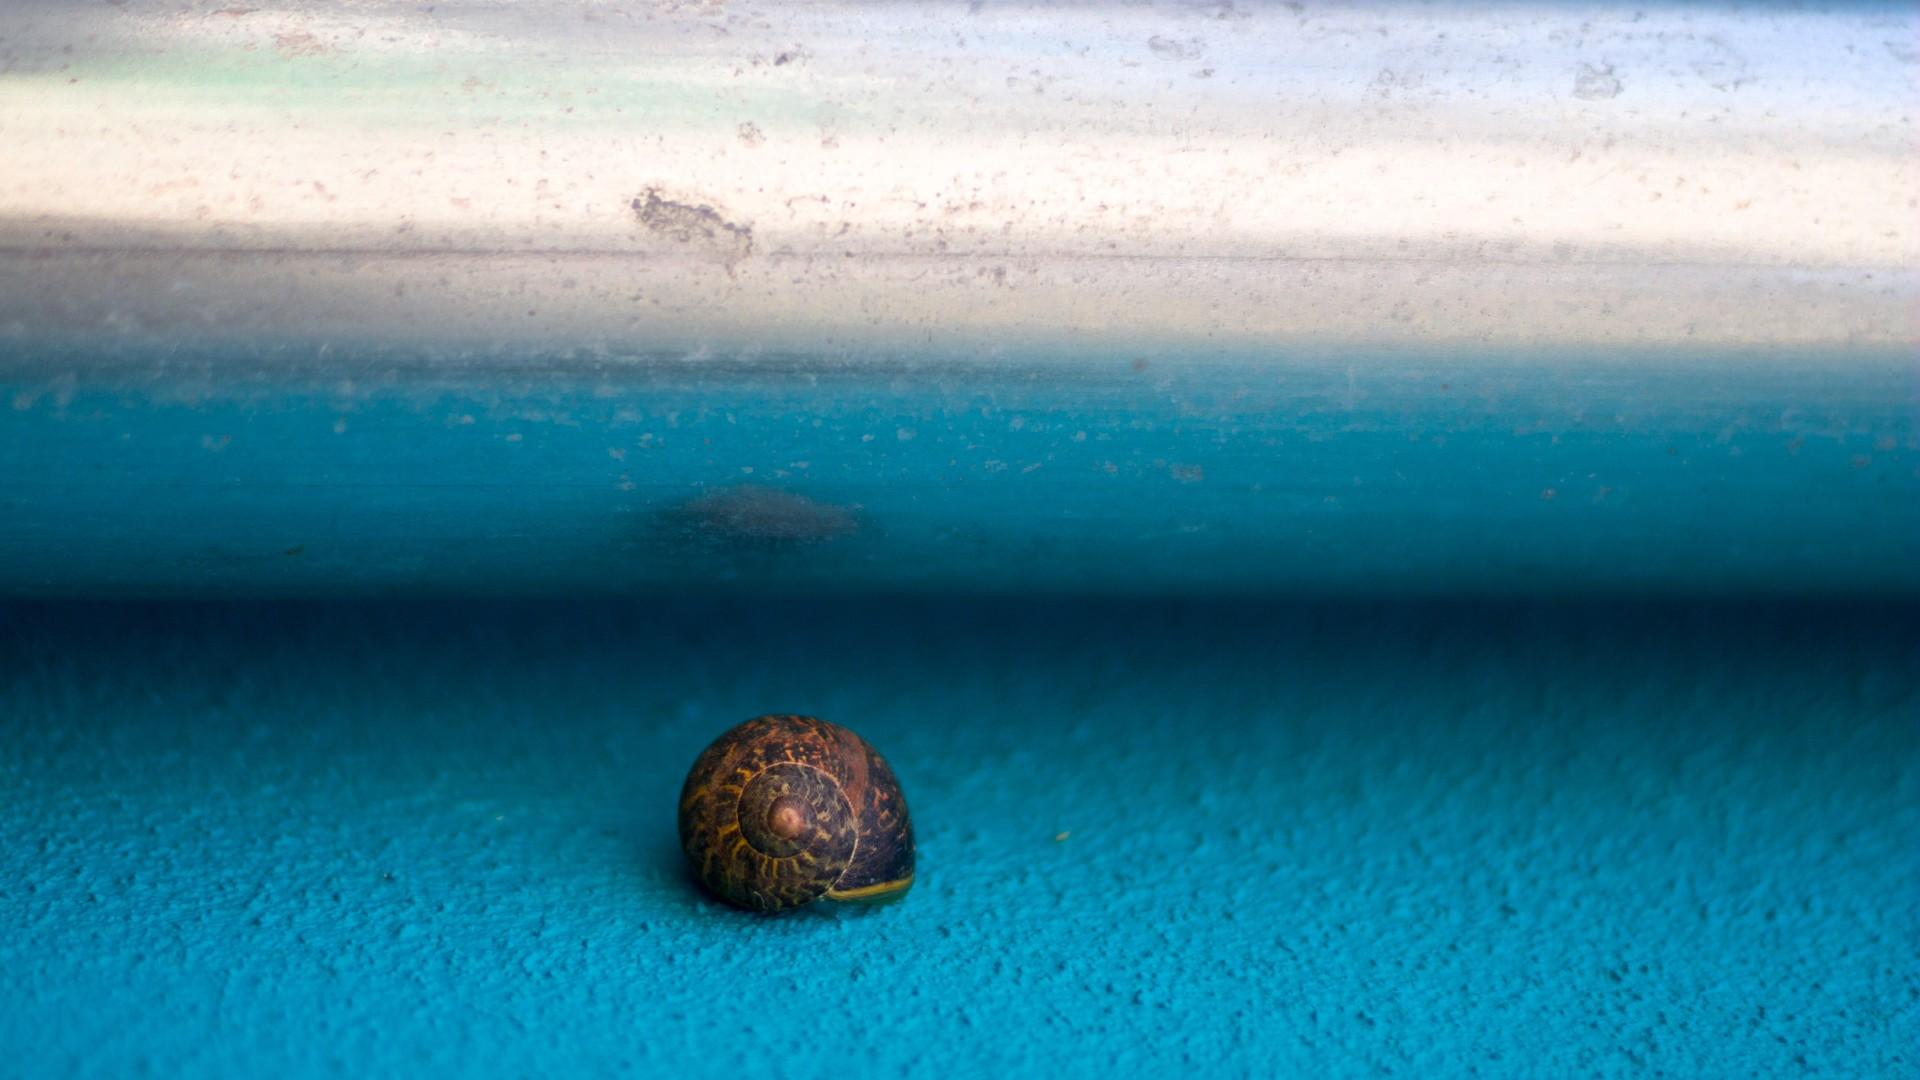 Animal Snail 1920x1080